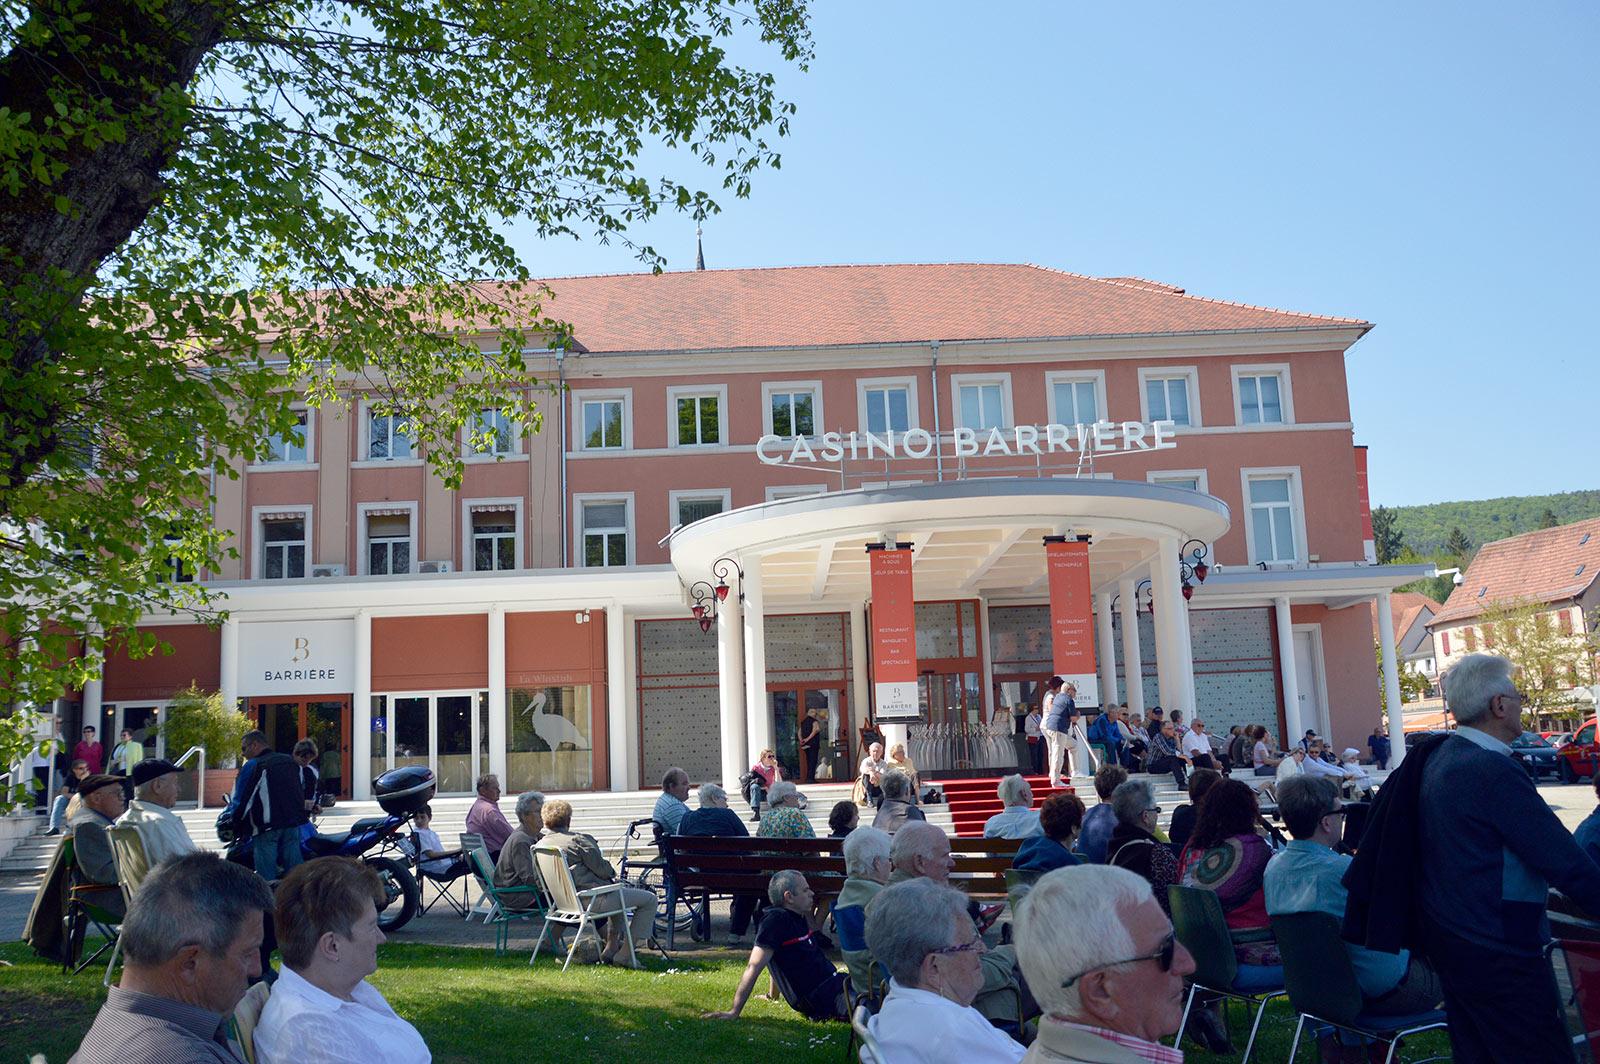 Spectacle de l'association folklorique de Herrenstein